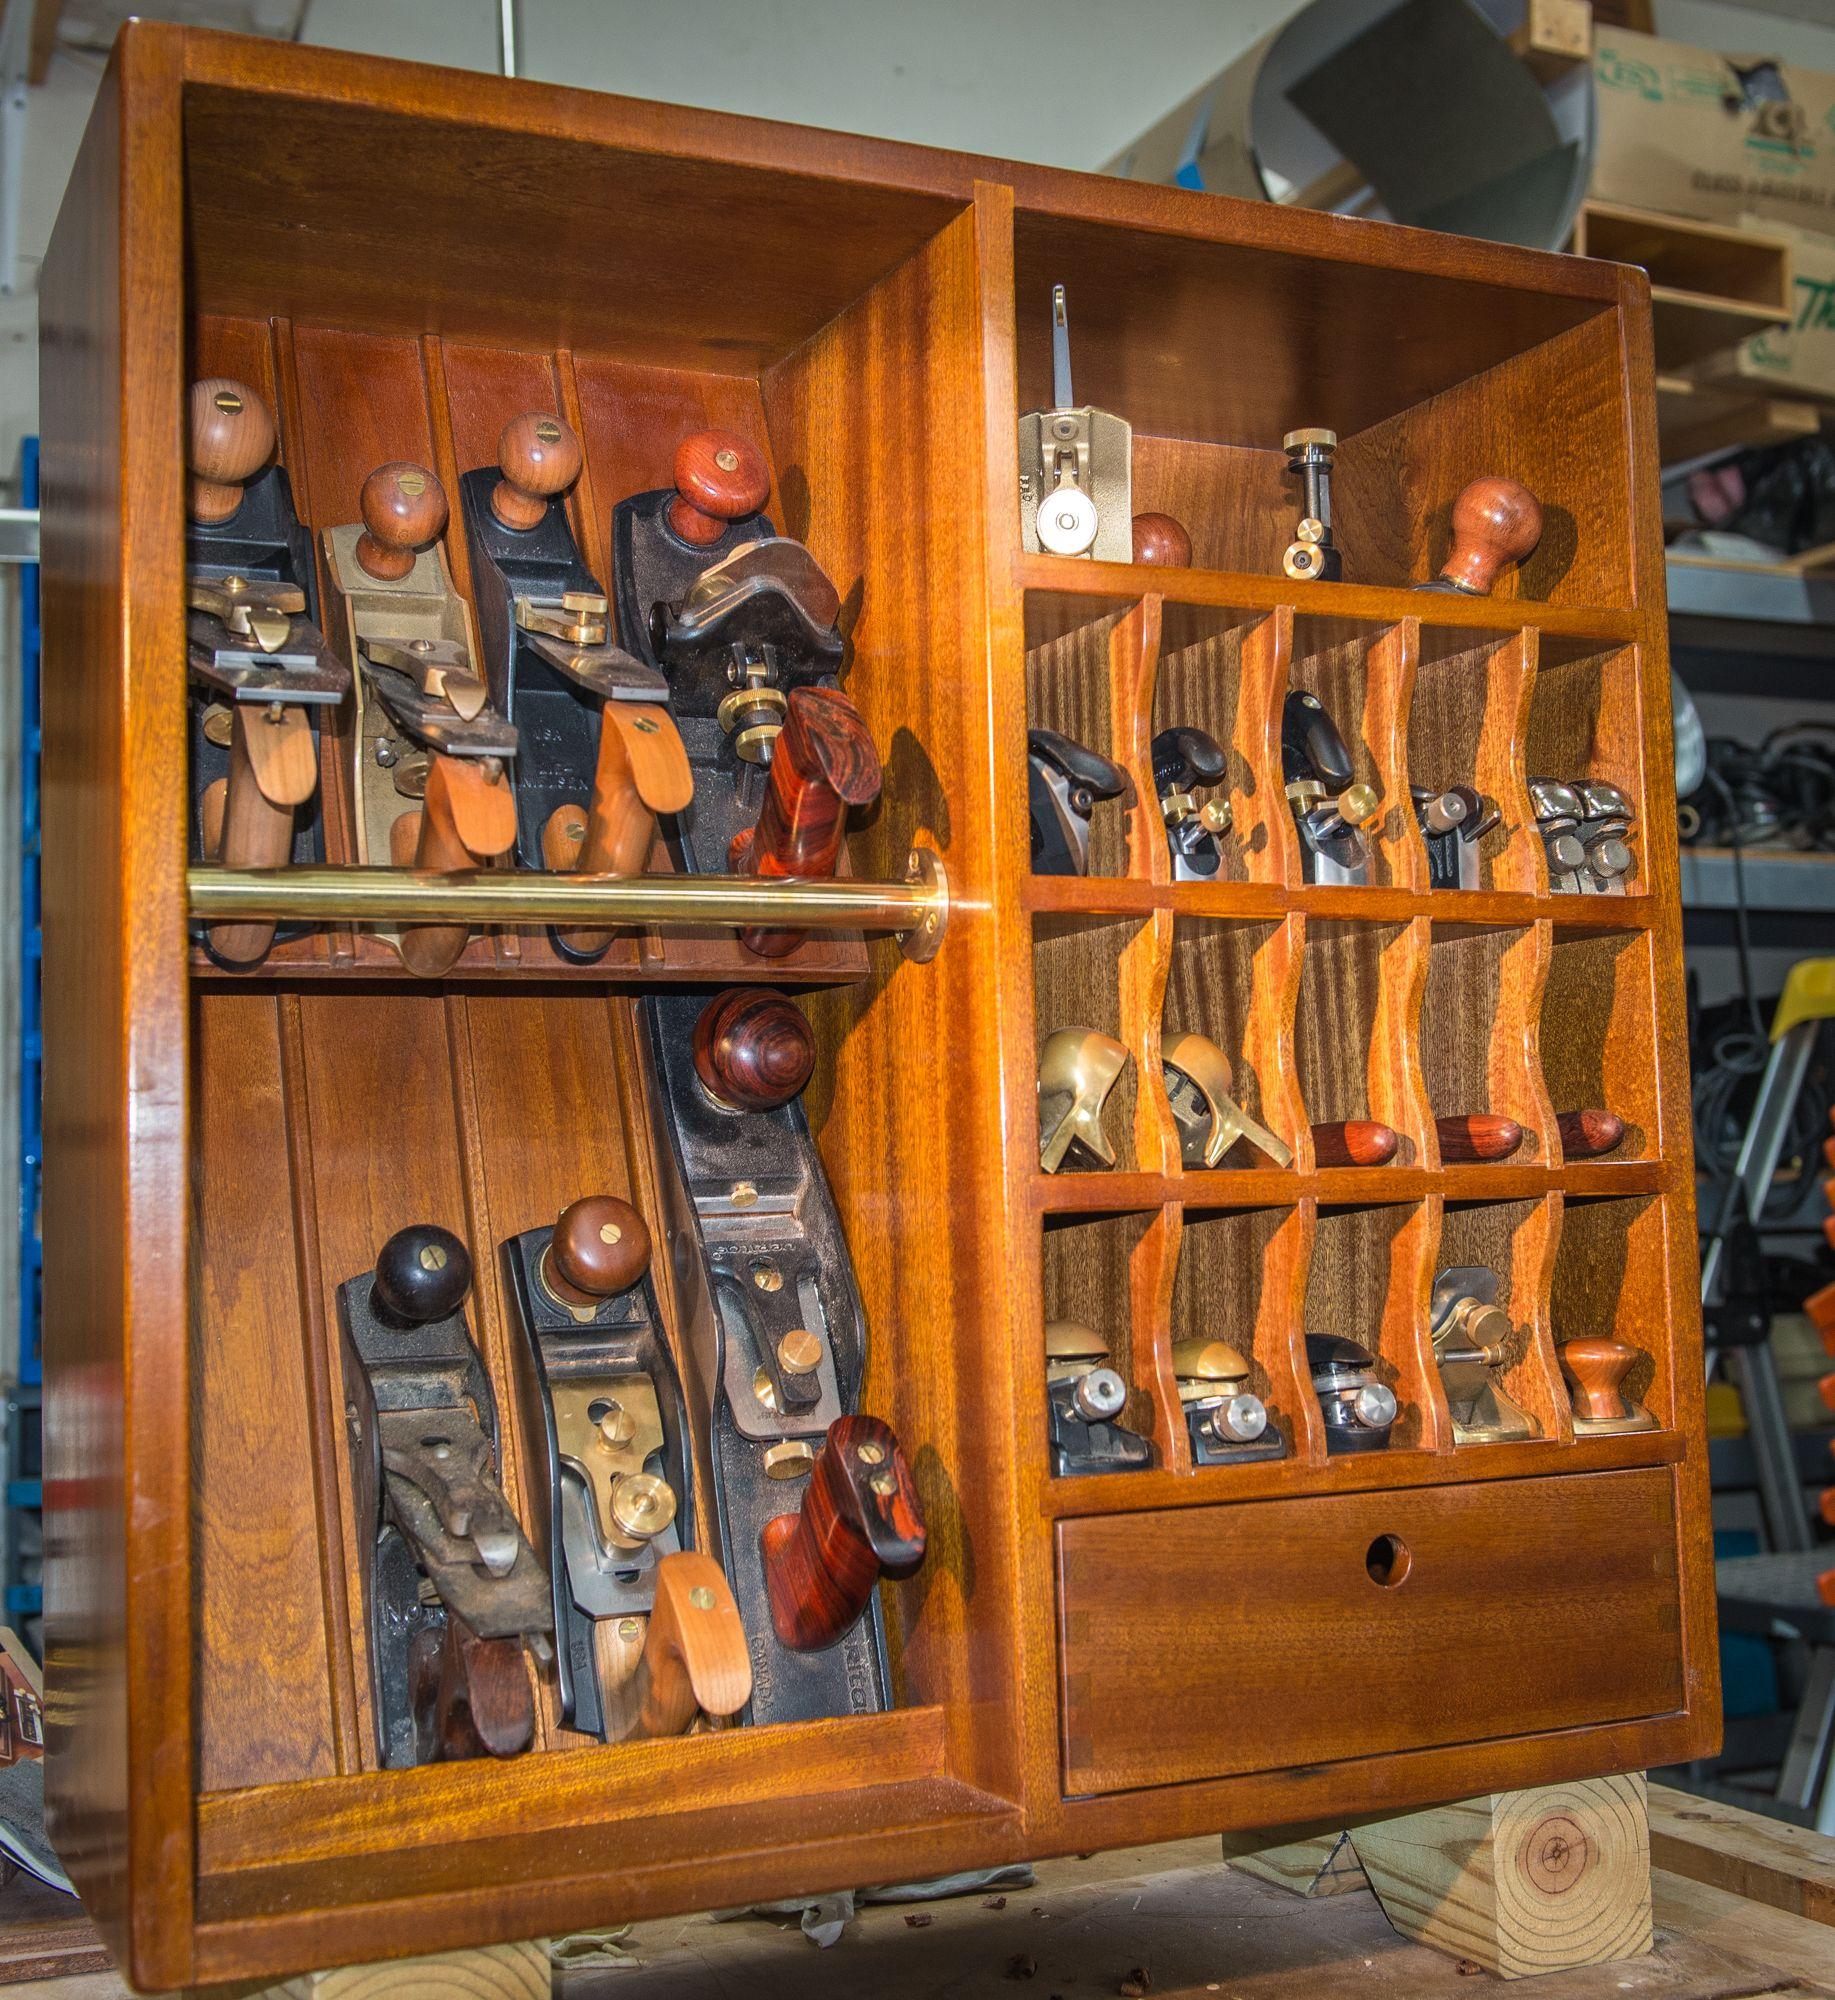 Merveilleux Mahogany Plane Till, Plane Cabinet, Tool Storage, Woodshop